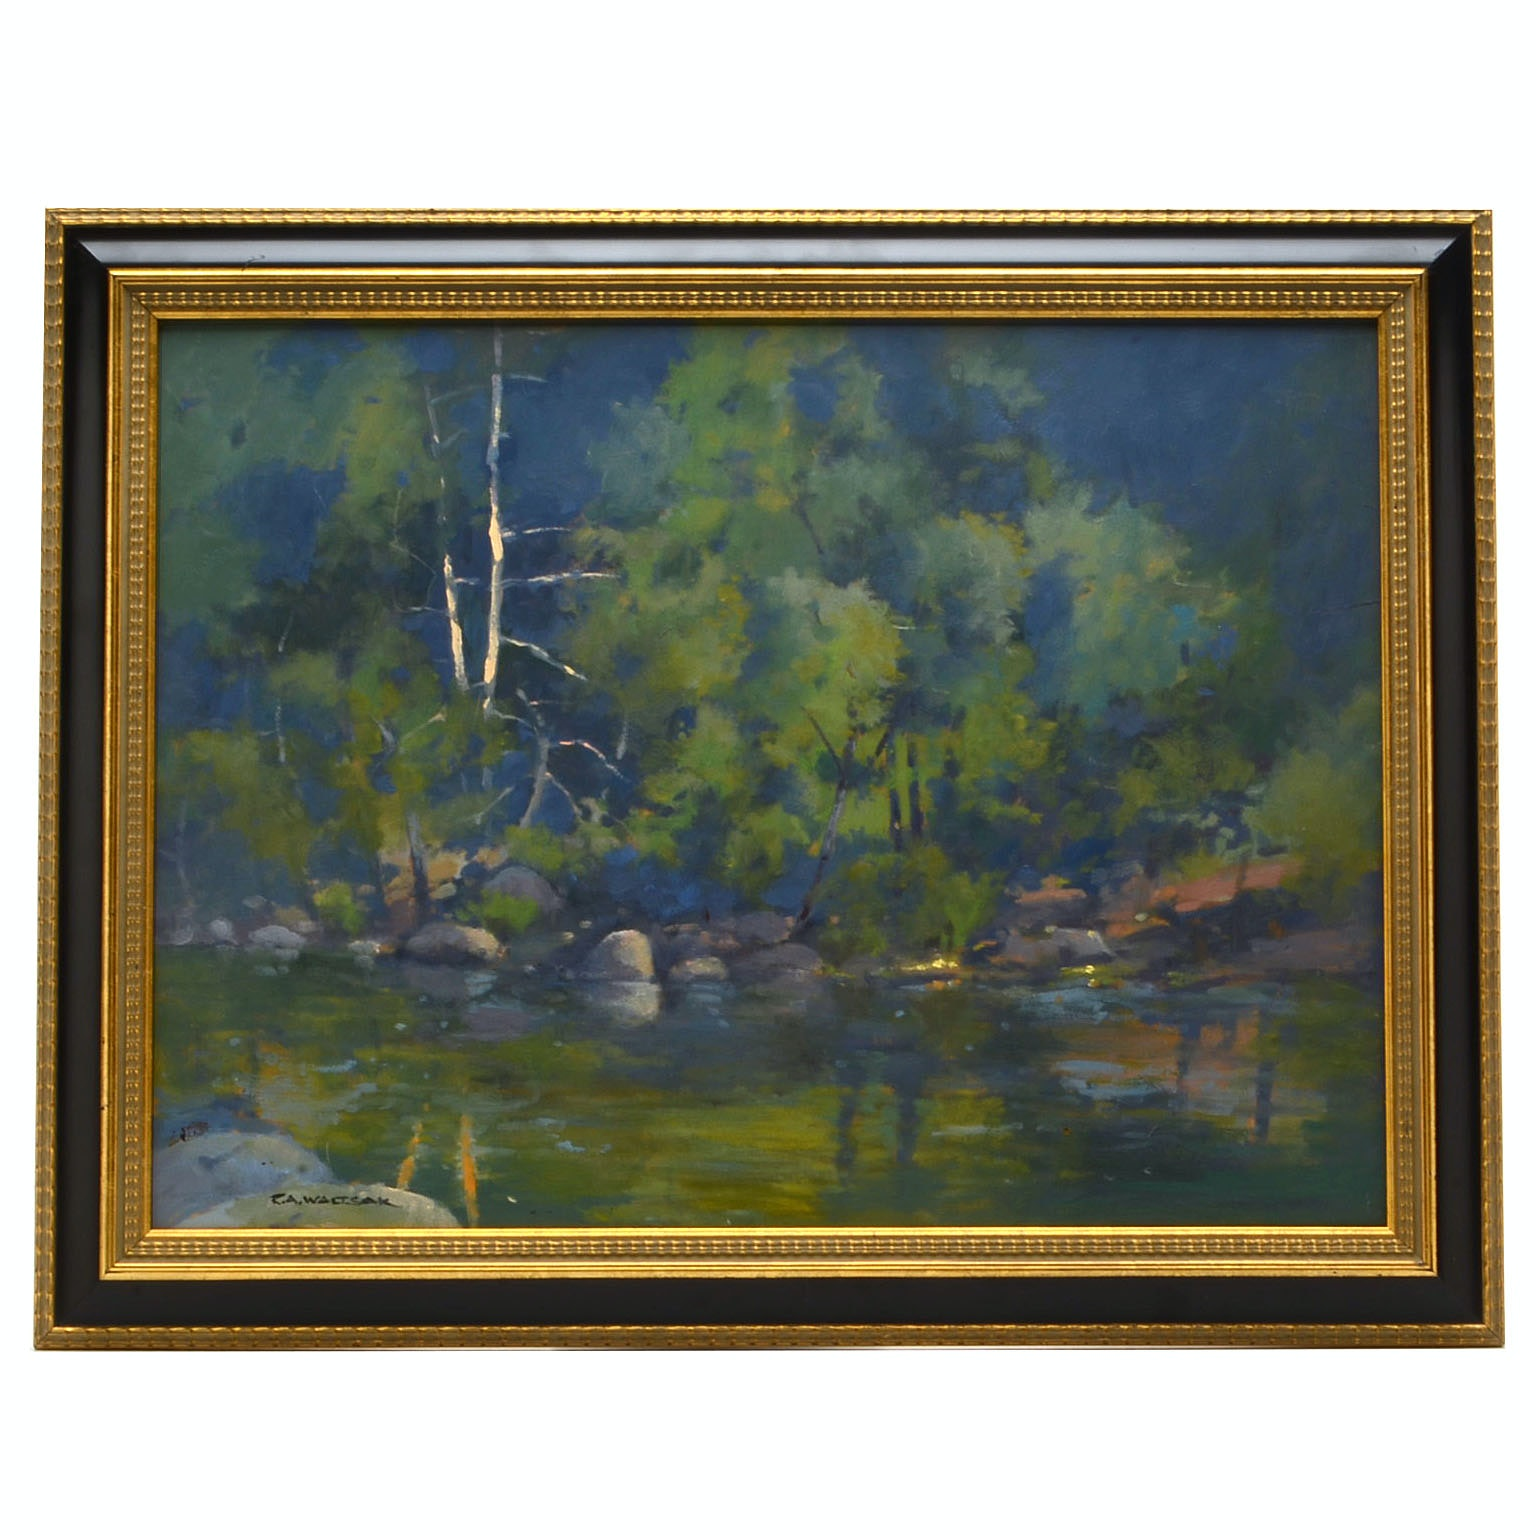 Robert A. Waltsak Original Oil Painting on Board